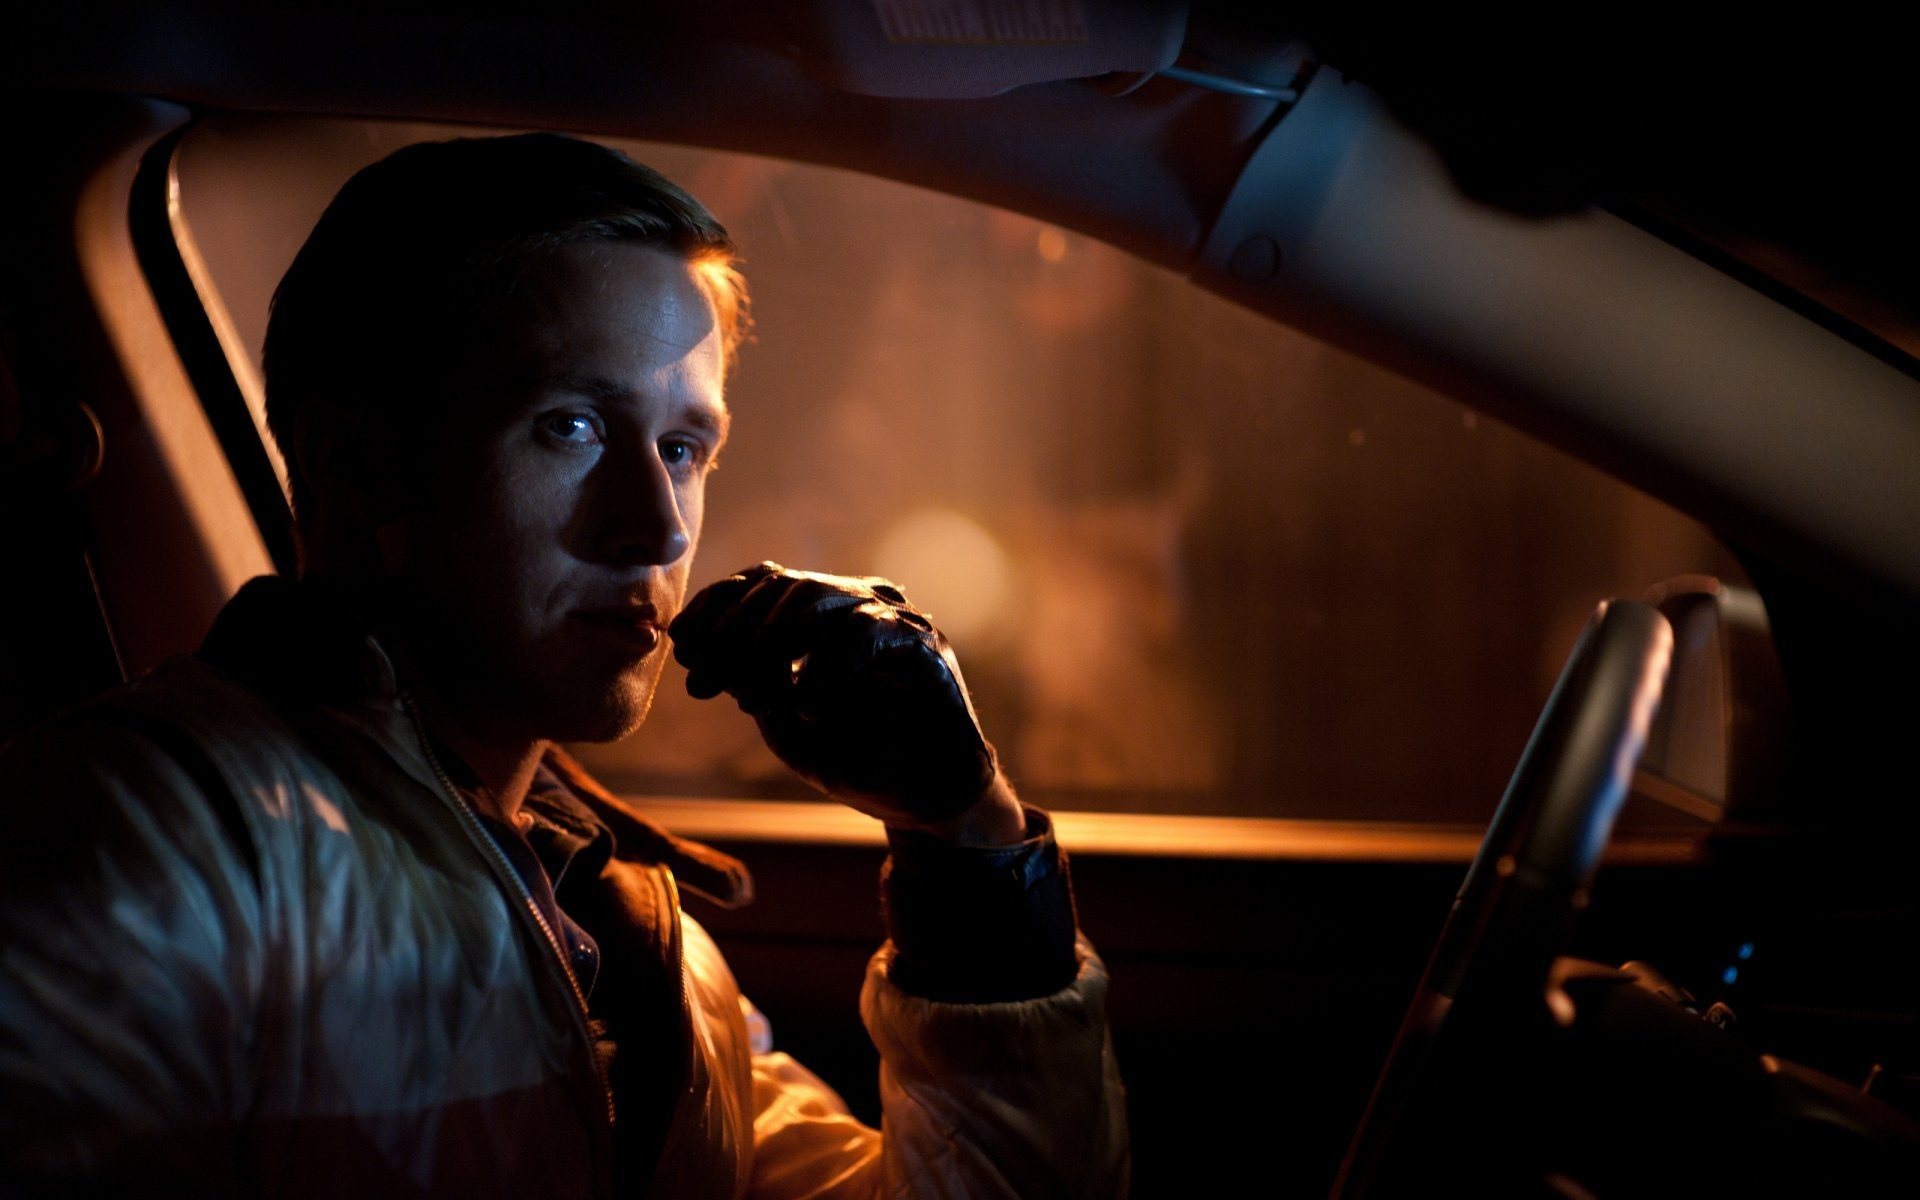 a movie film drive drive united kingdom ryan gosling ryan gosling machine  salon